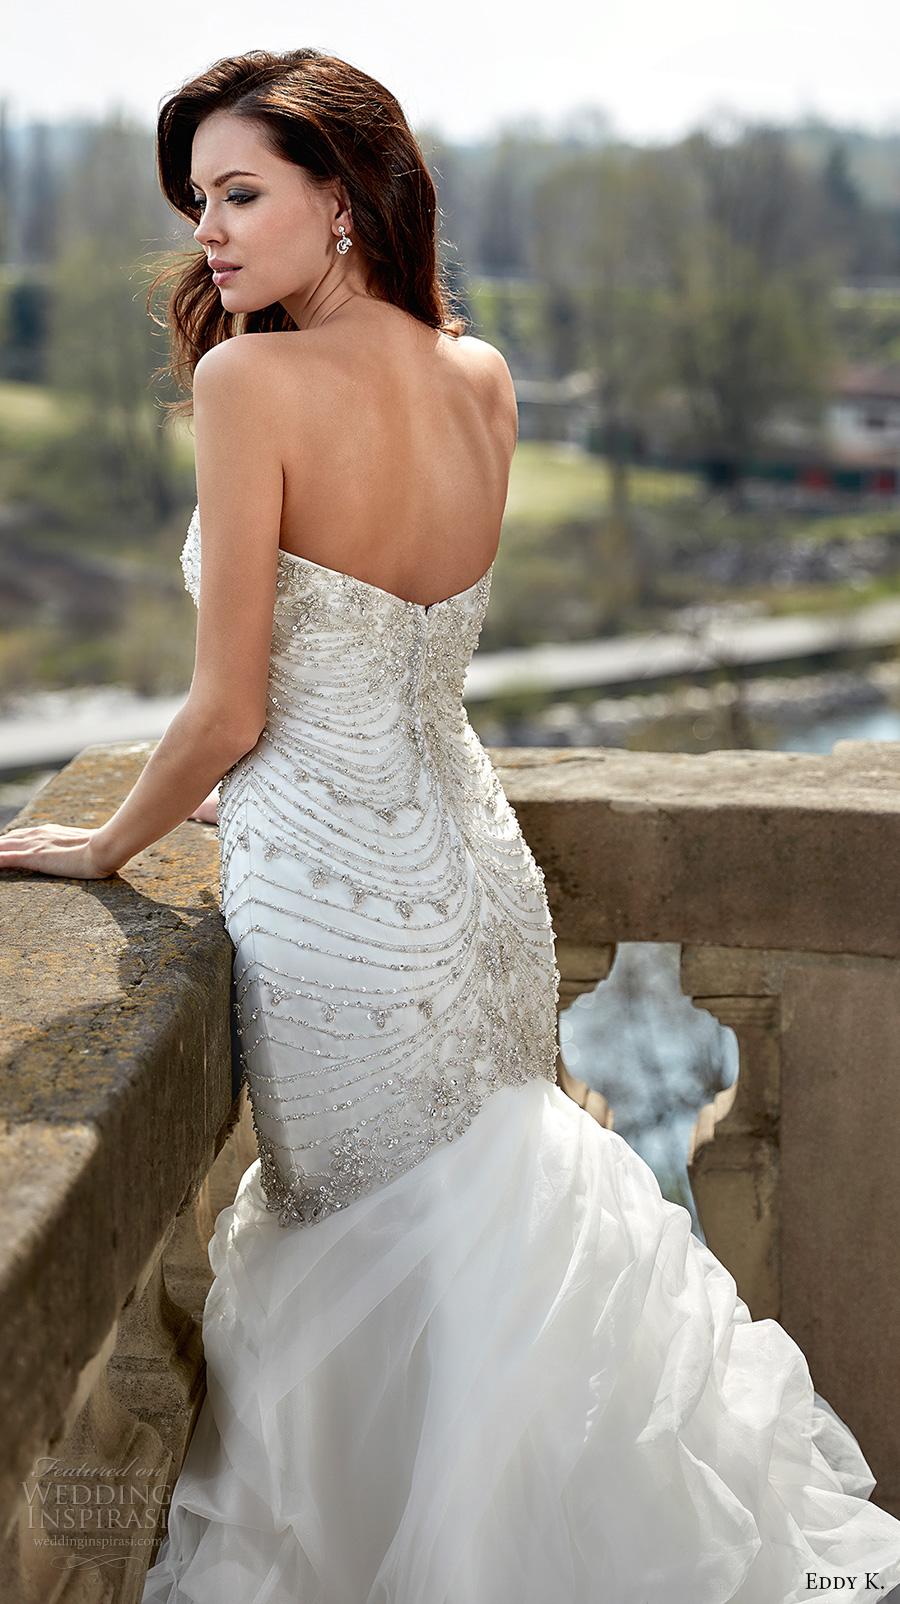 Demetrios Mermaid Wedding Dress 74 Perfect eddy k couture bridal